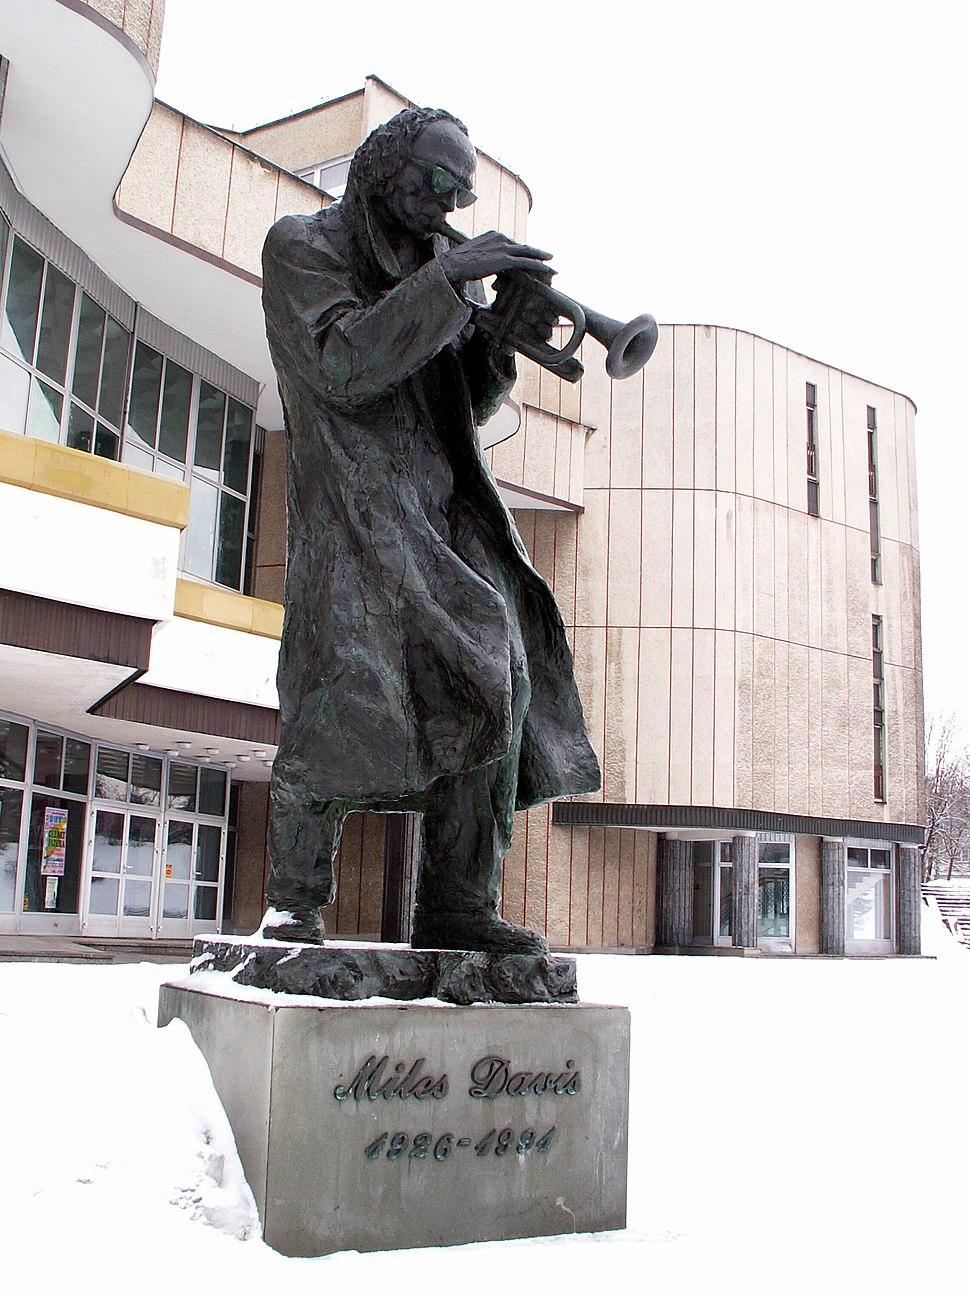 Pomnik Milesa Davisa Kielce 01 ssj 20060304